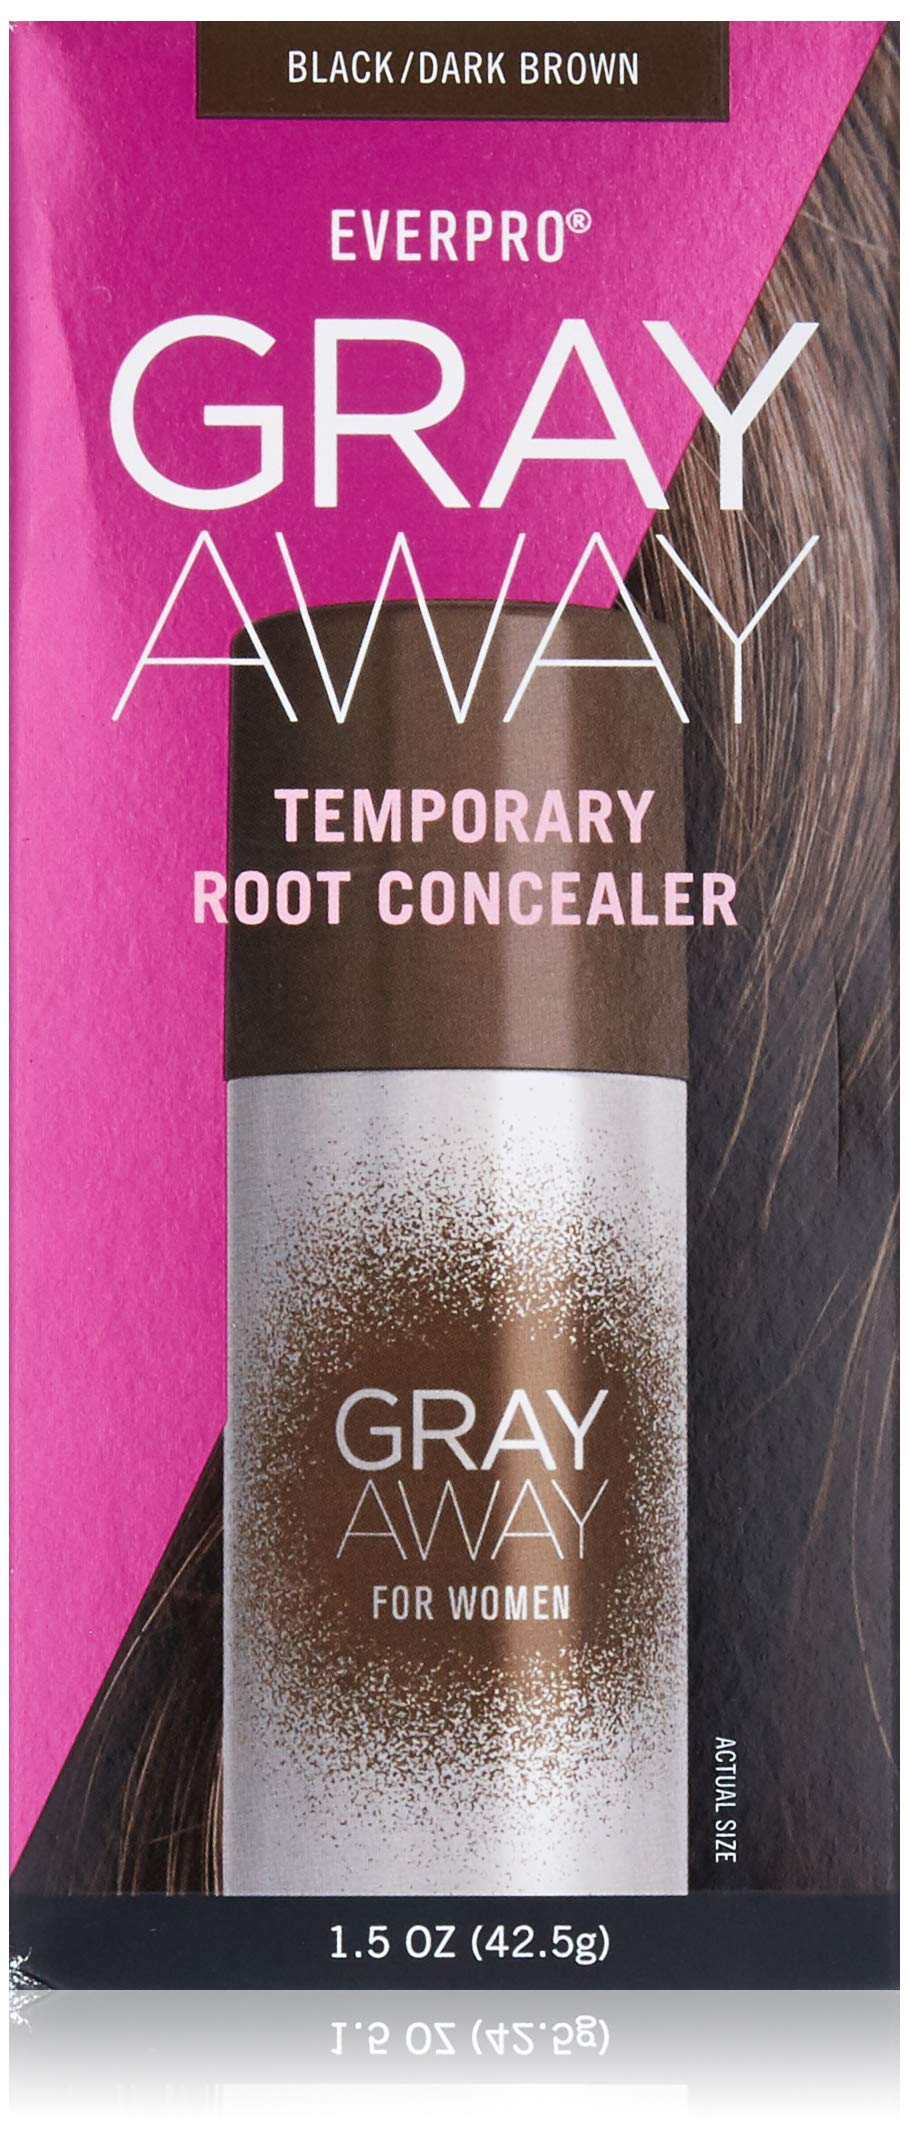 Everpro Gray Away Temporary Root